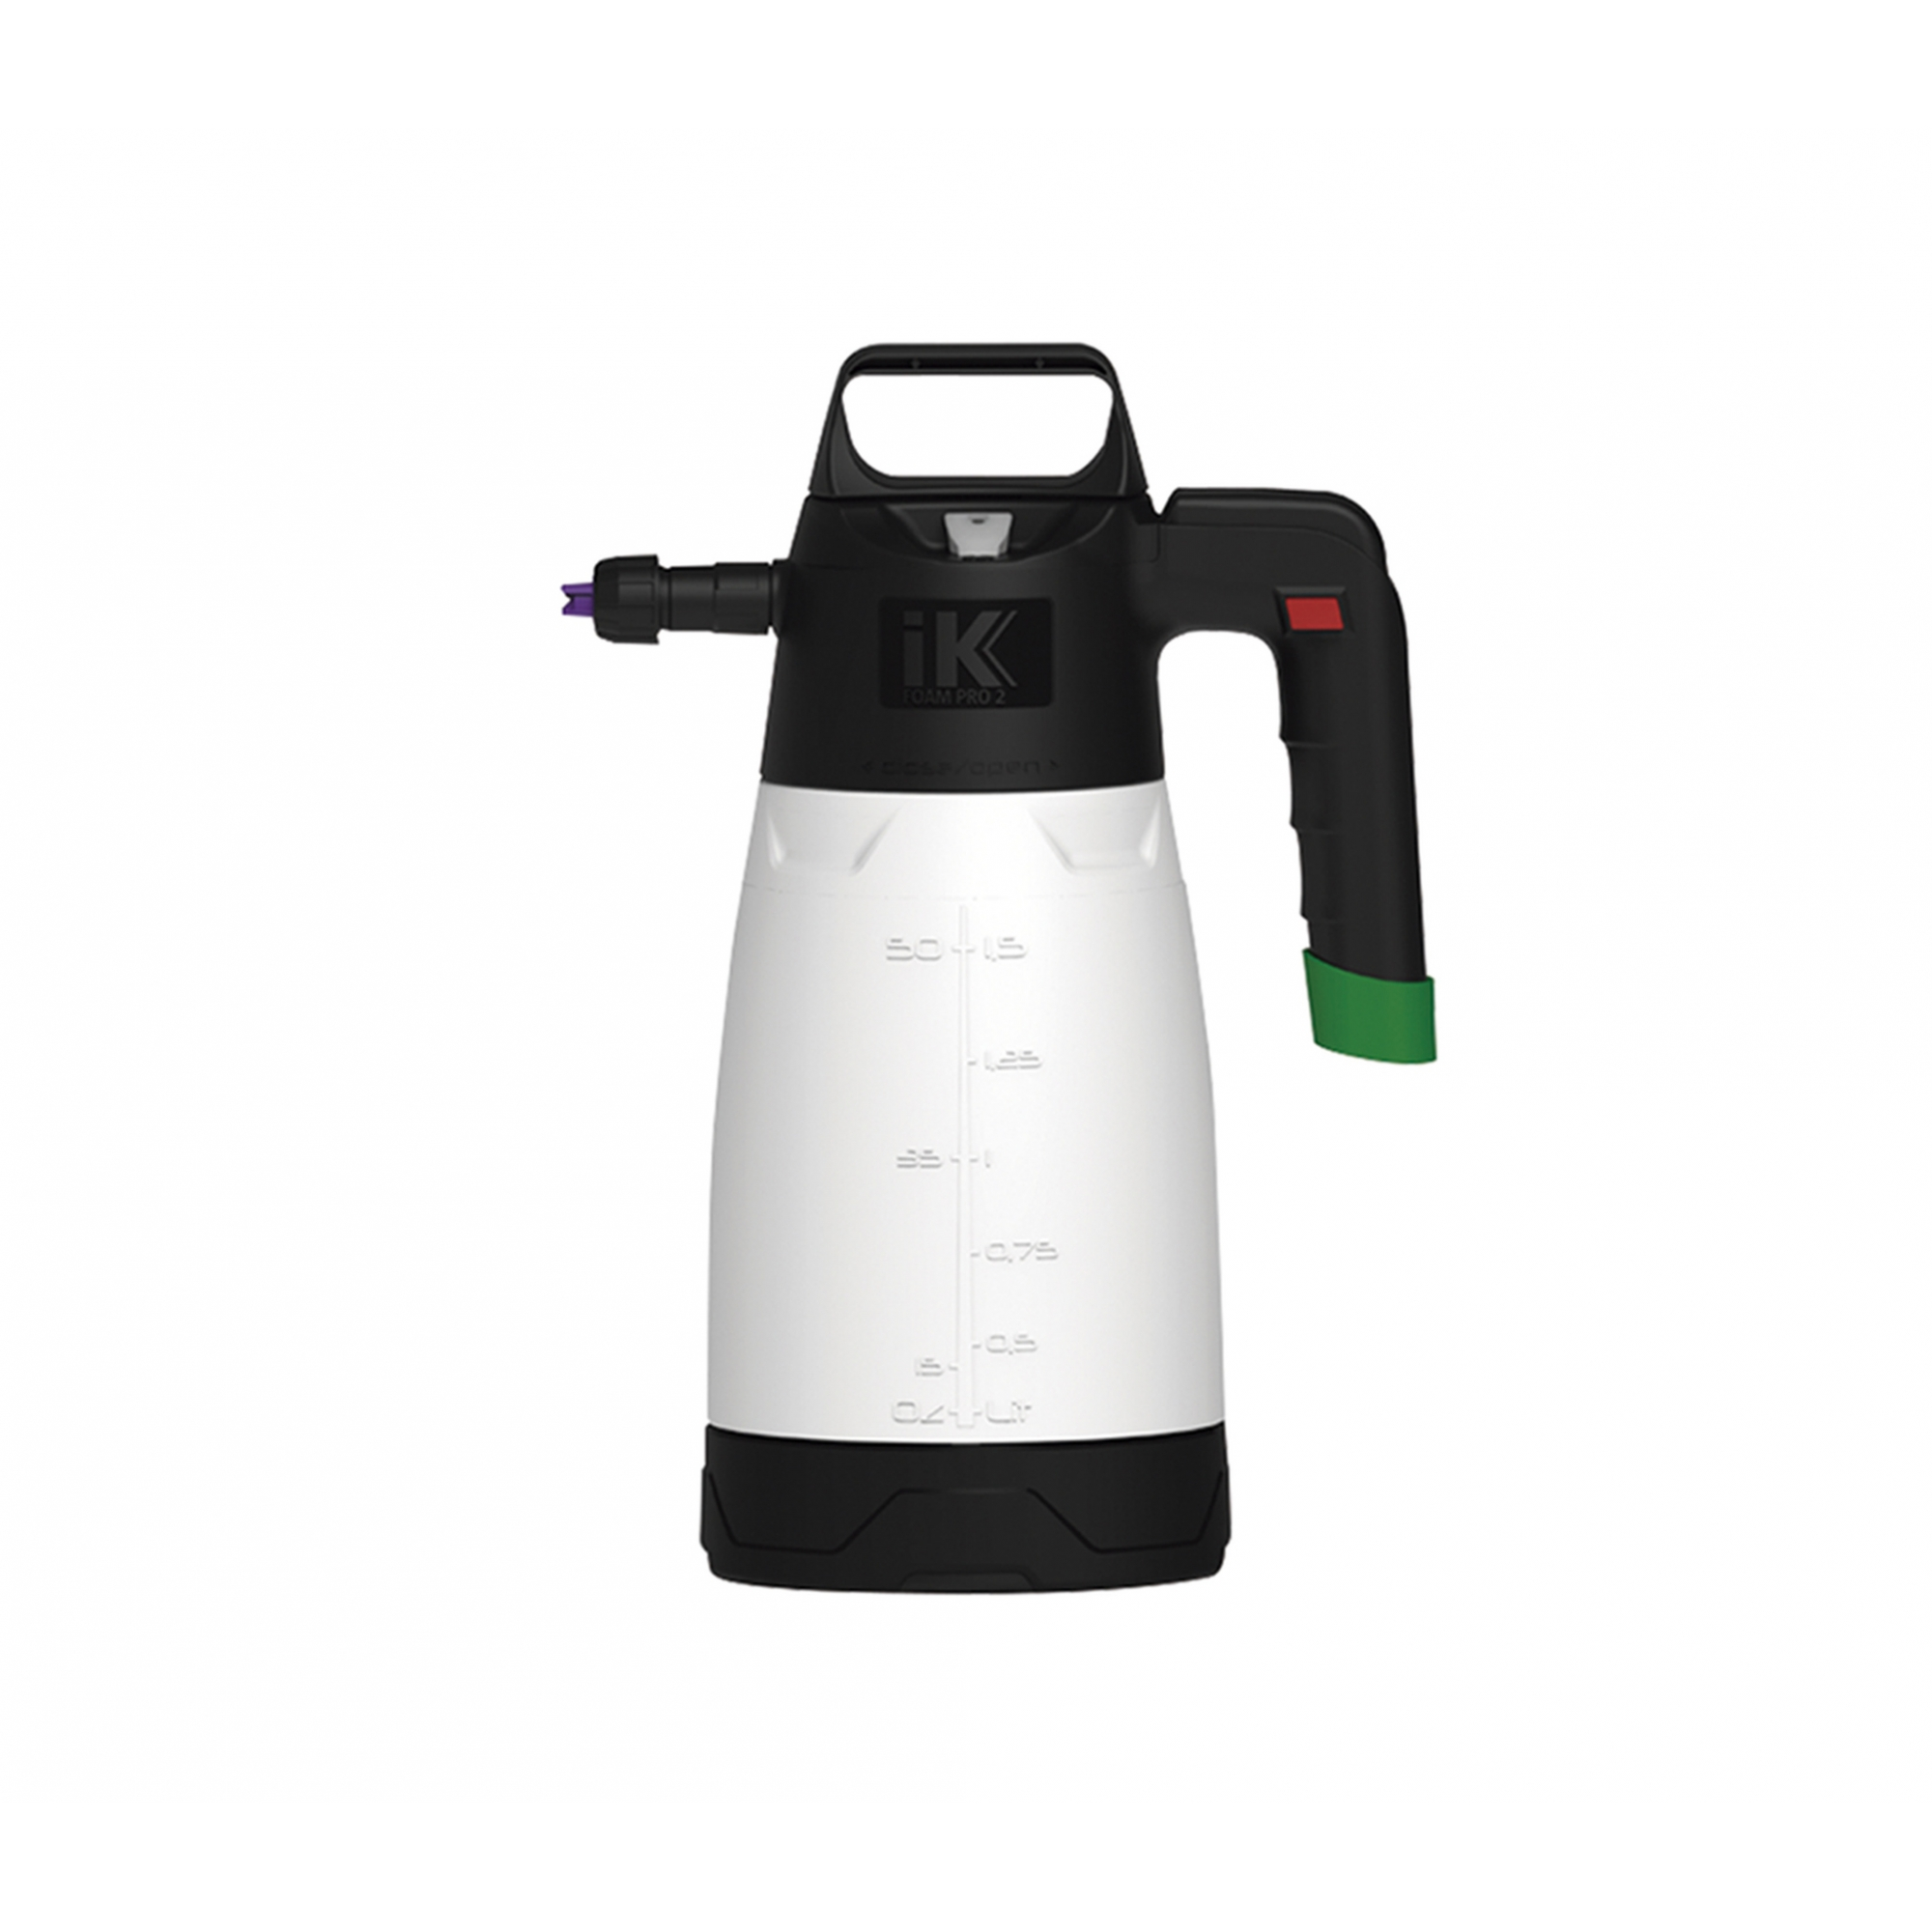 Pulverizador Profissional IK FOAM Pro 2